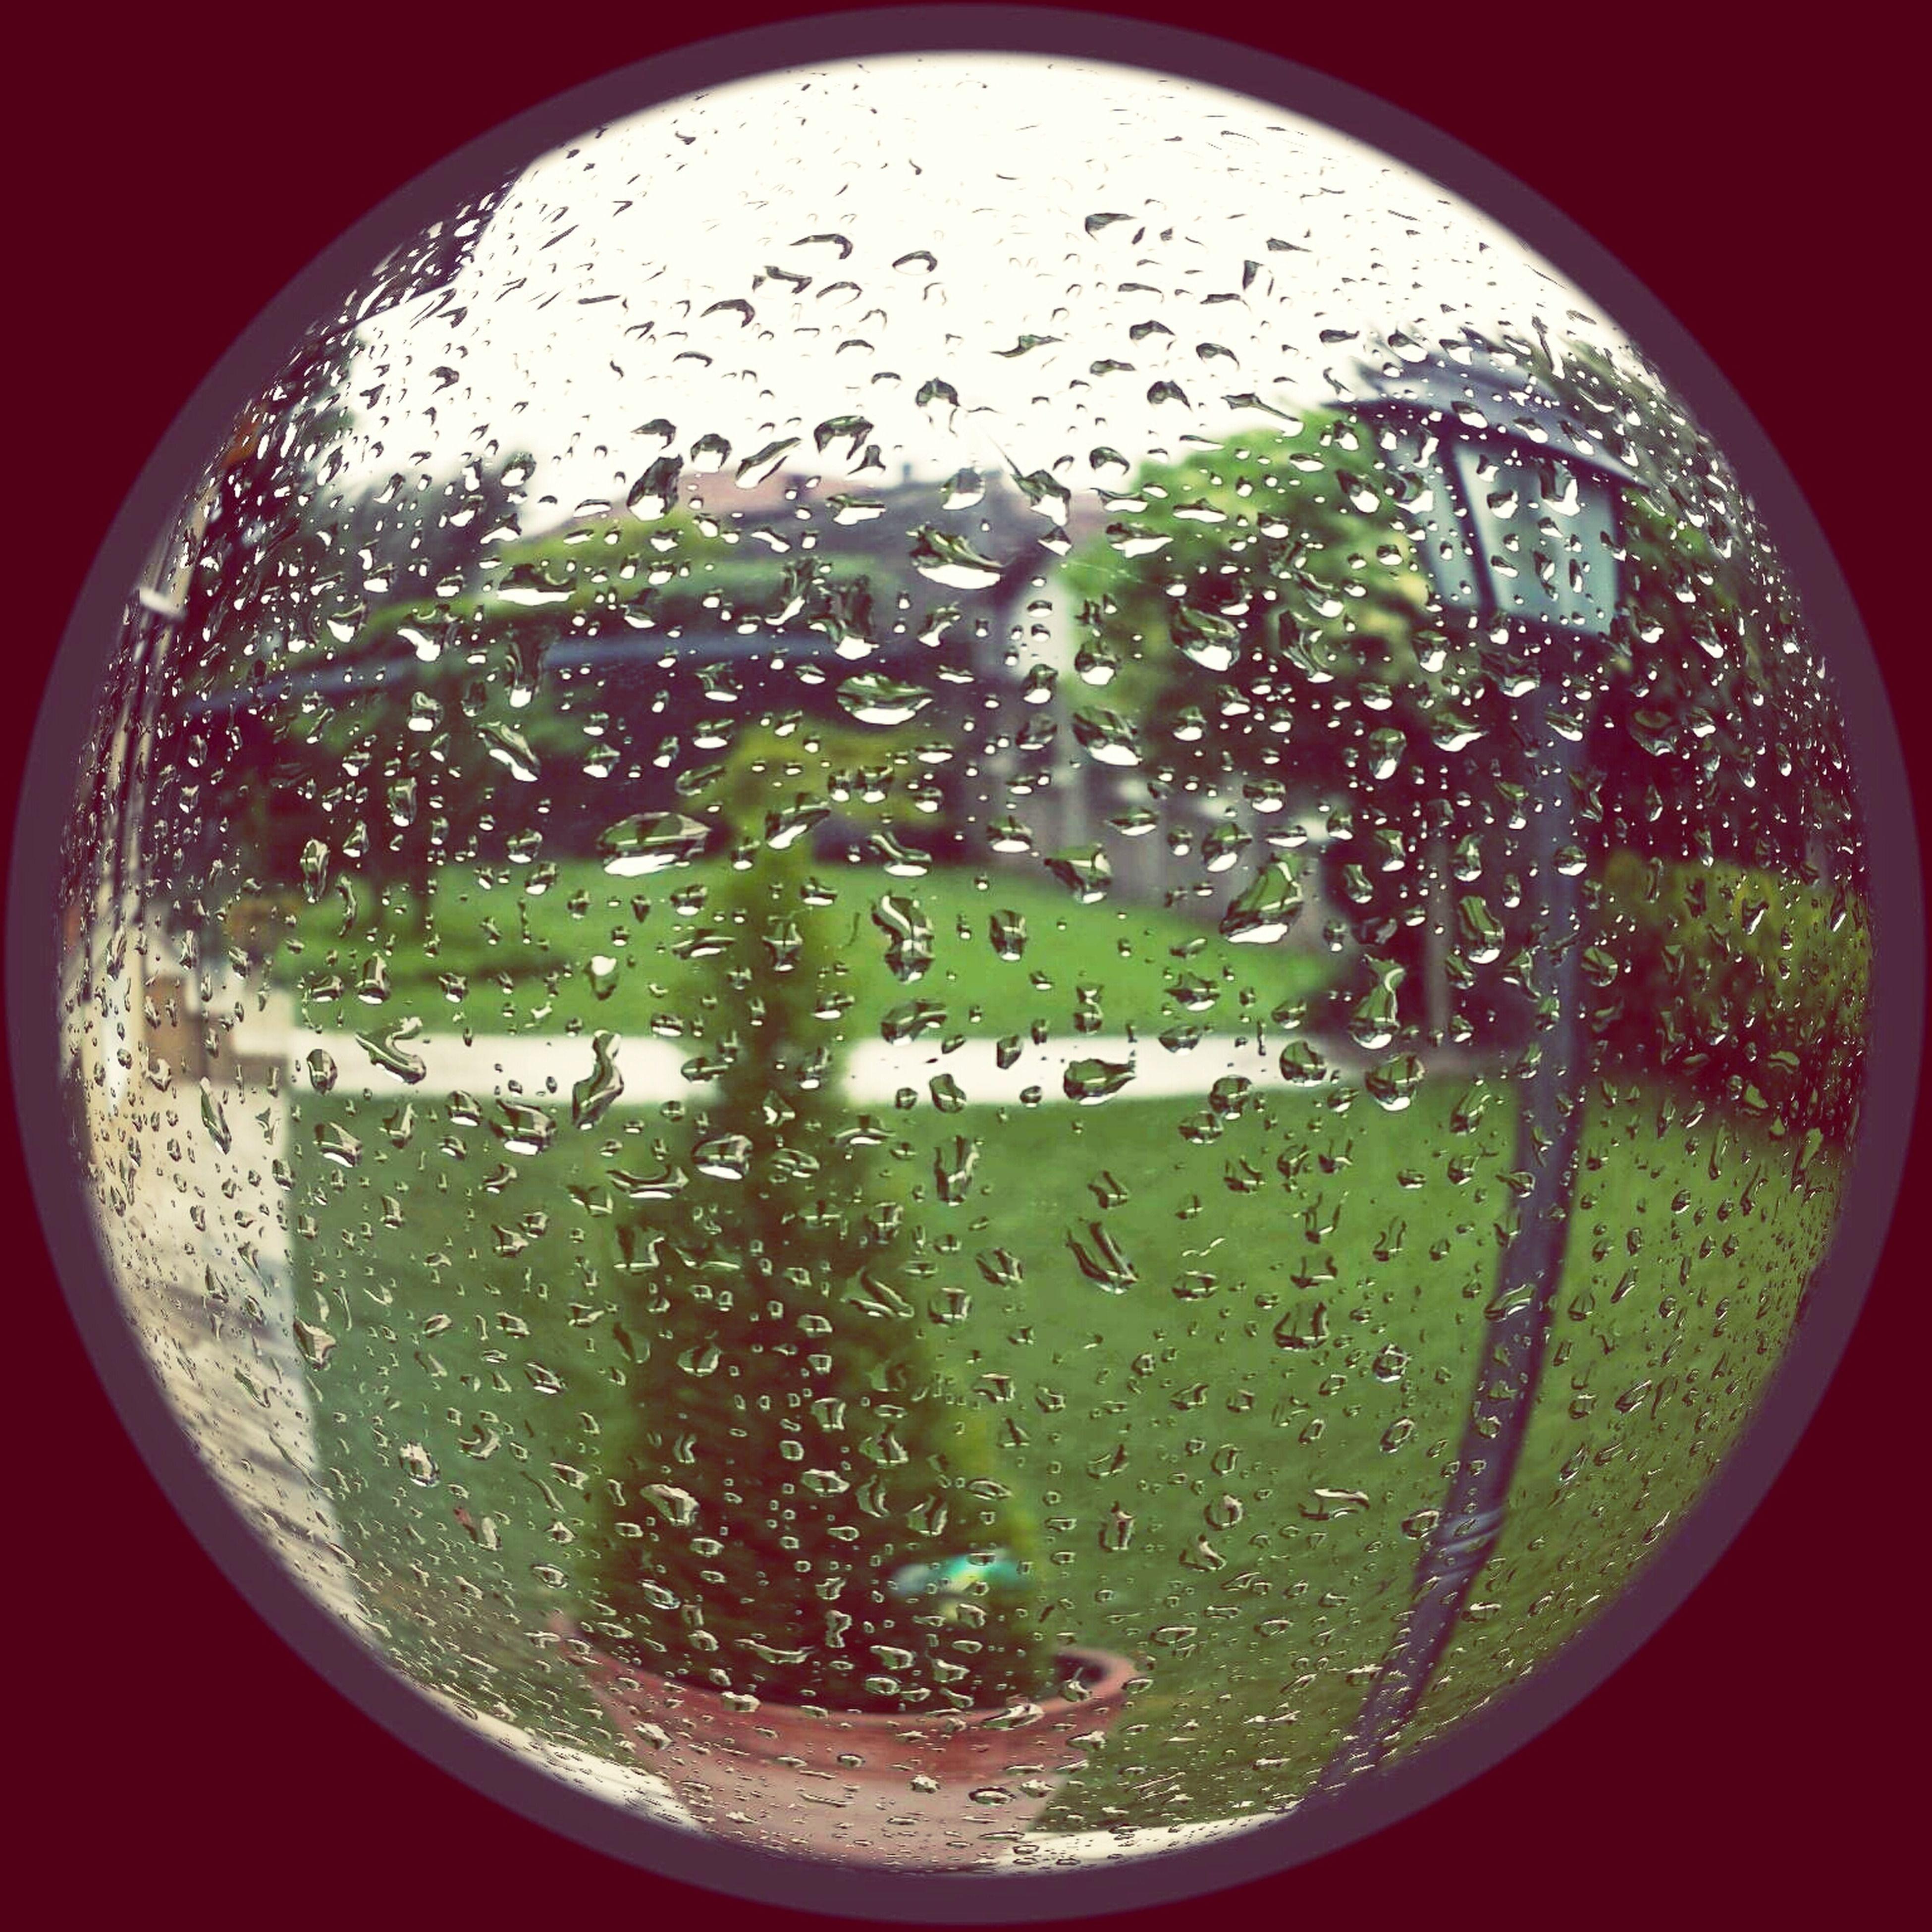 transparent, window, glass - material, drop, wet, indoors, rain, water, glass, season, raindrop, weather, car, vehicle interior, close-up, water drop, tree, droplet, looking through window, transportation